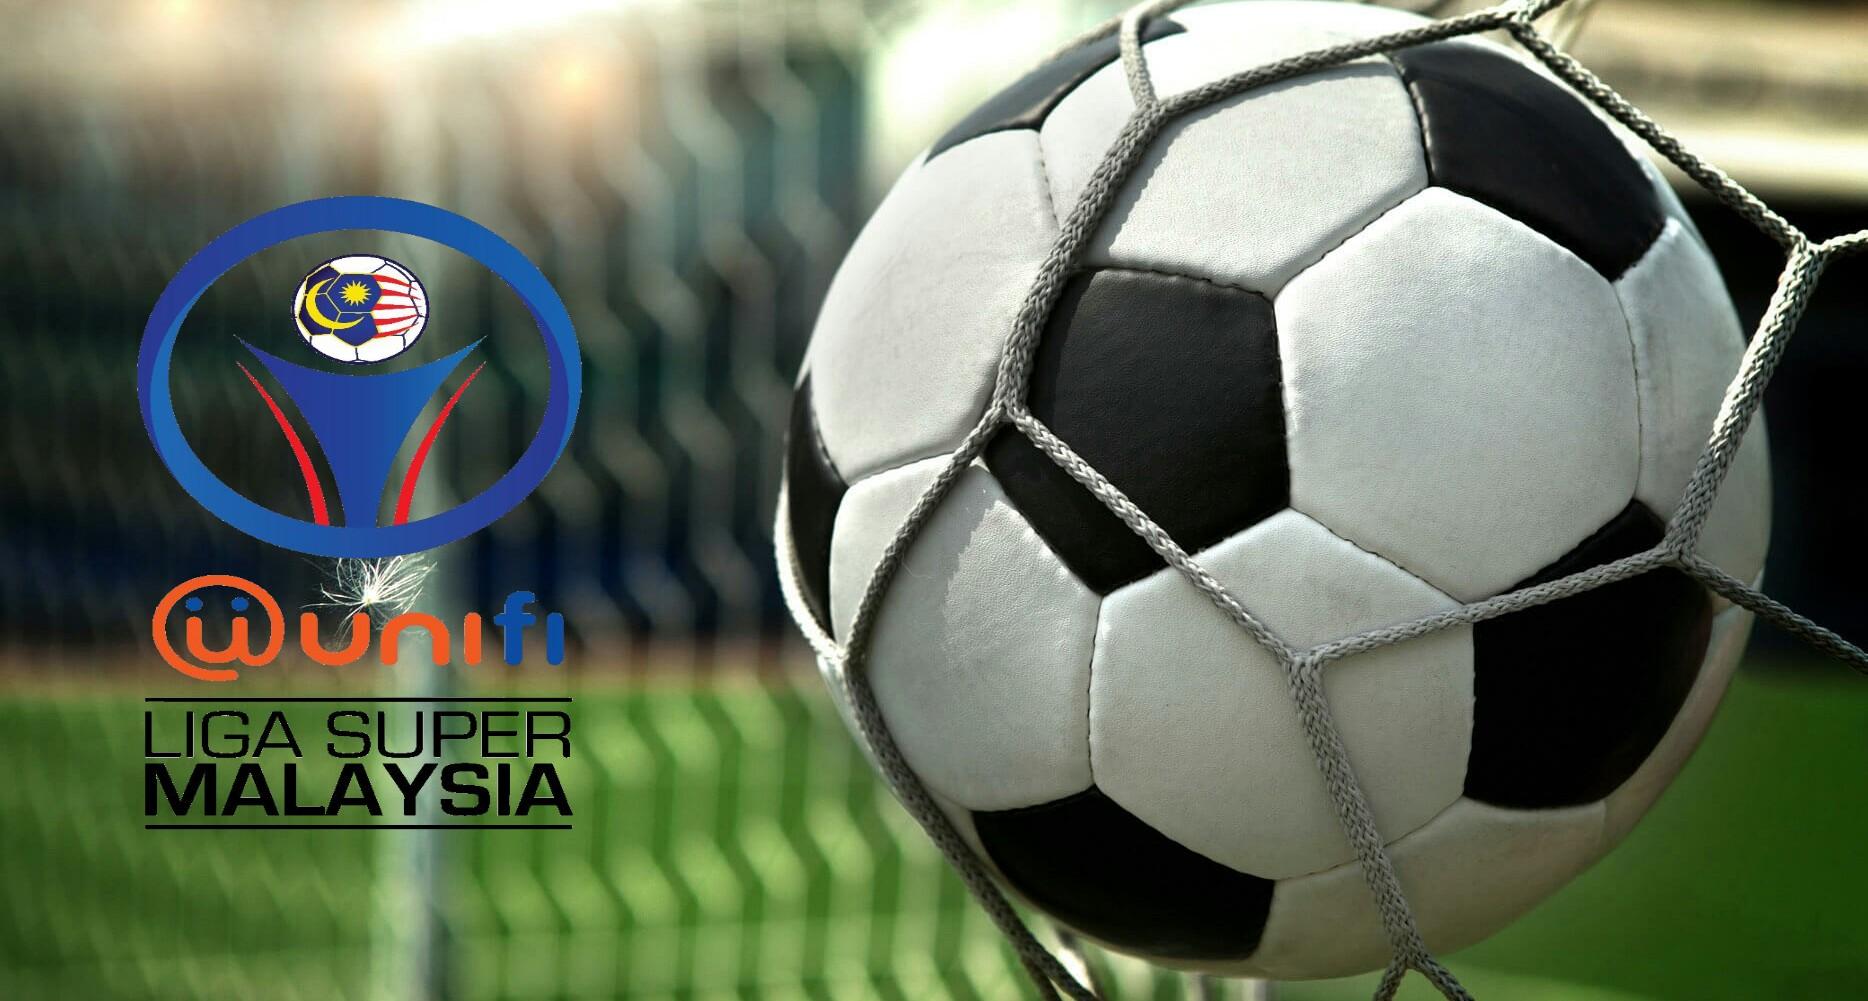 Jadual Liga Super 2019 Malaysia Keputusan Carta Kedudukan